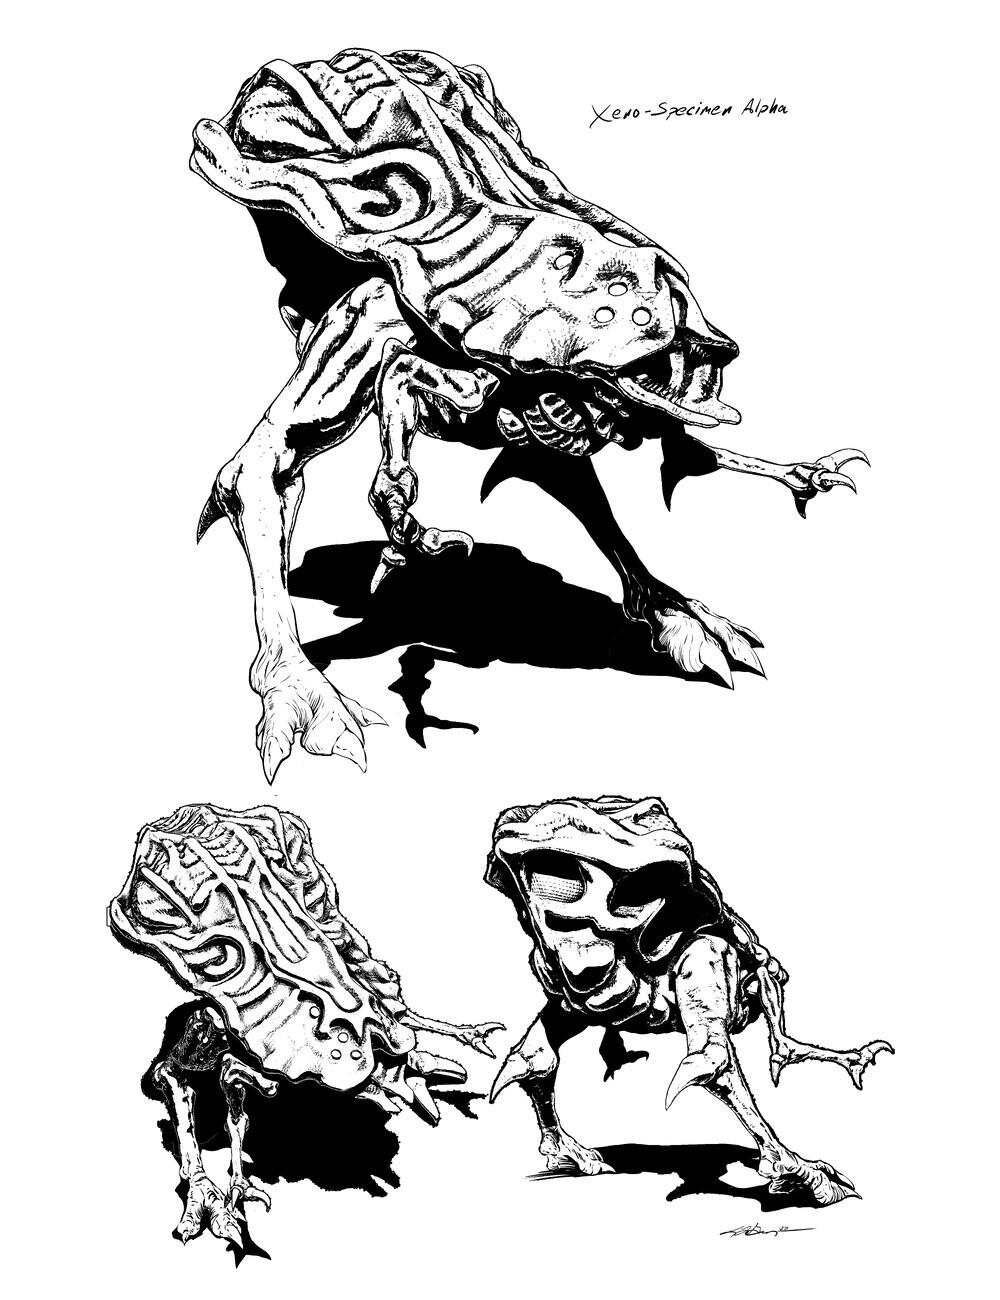 Concept art behind the critter...